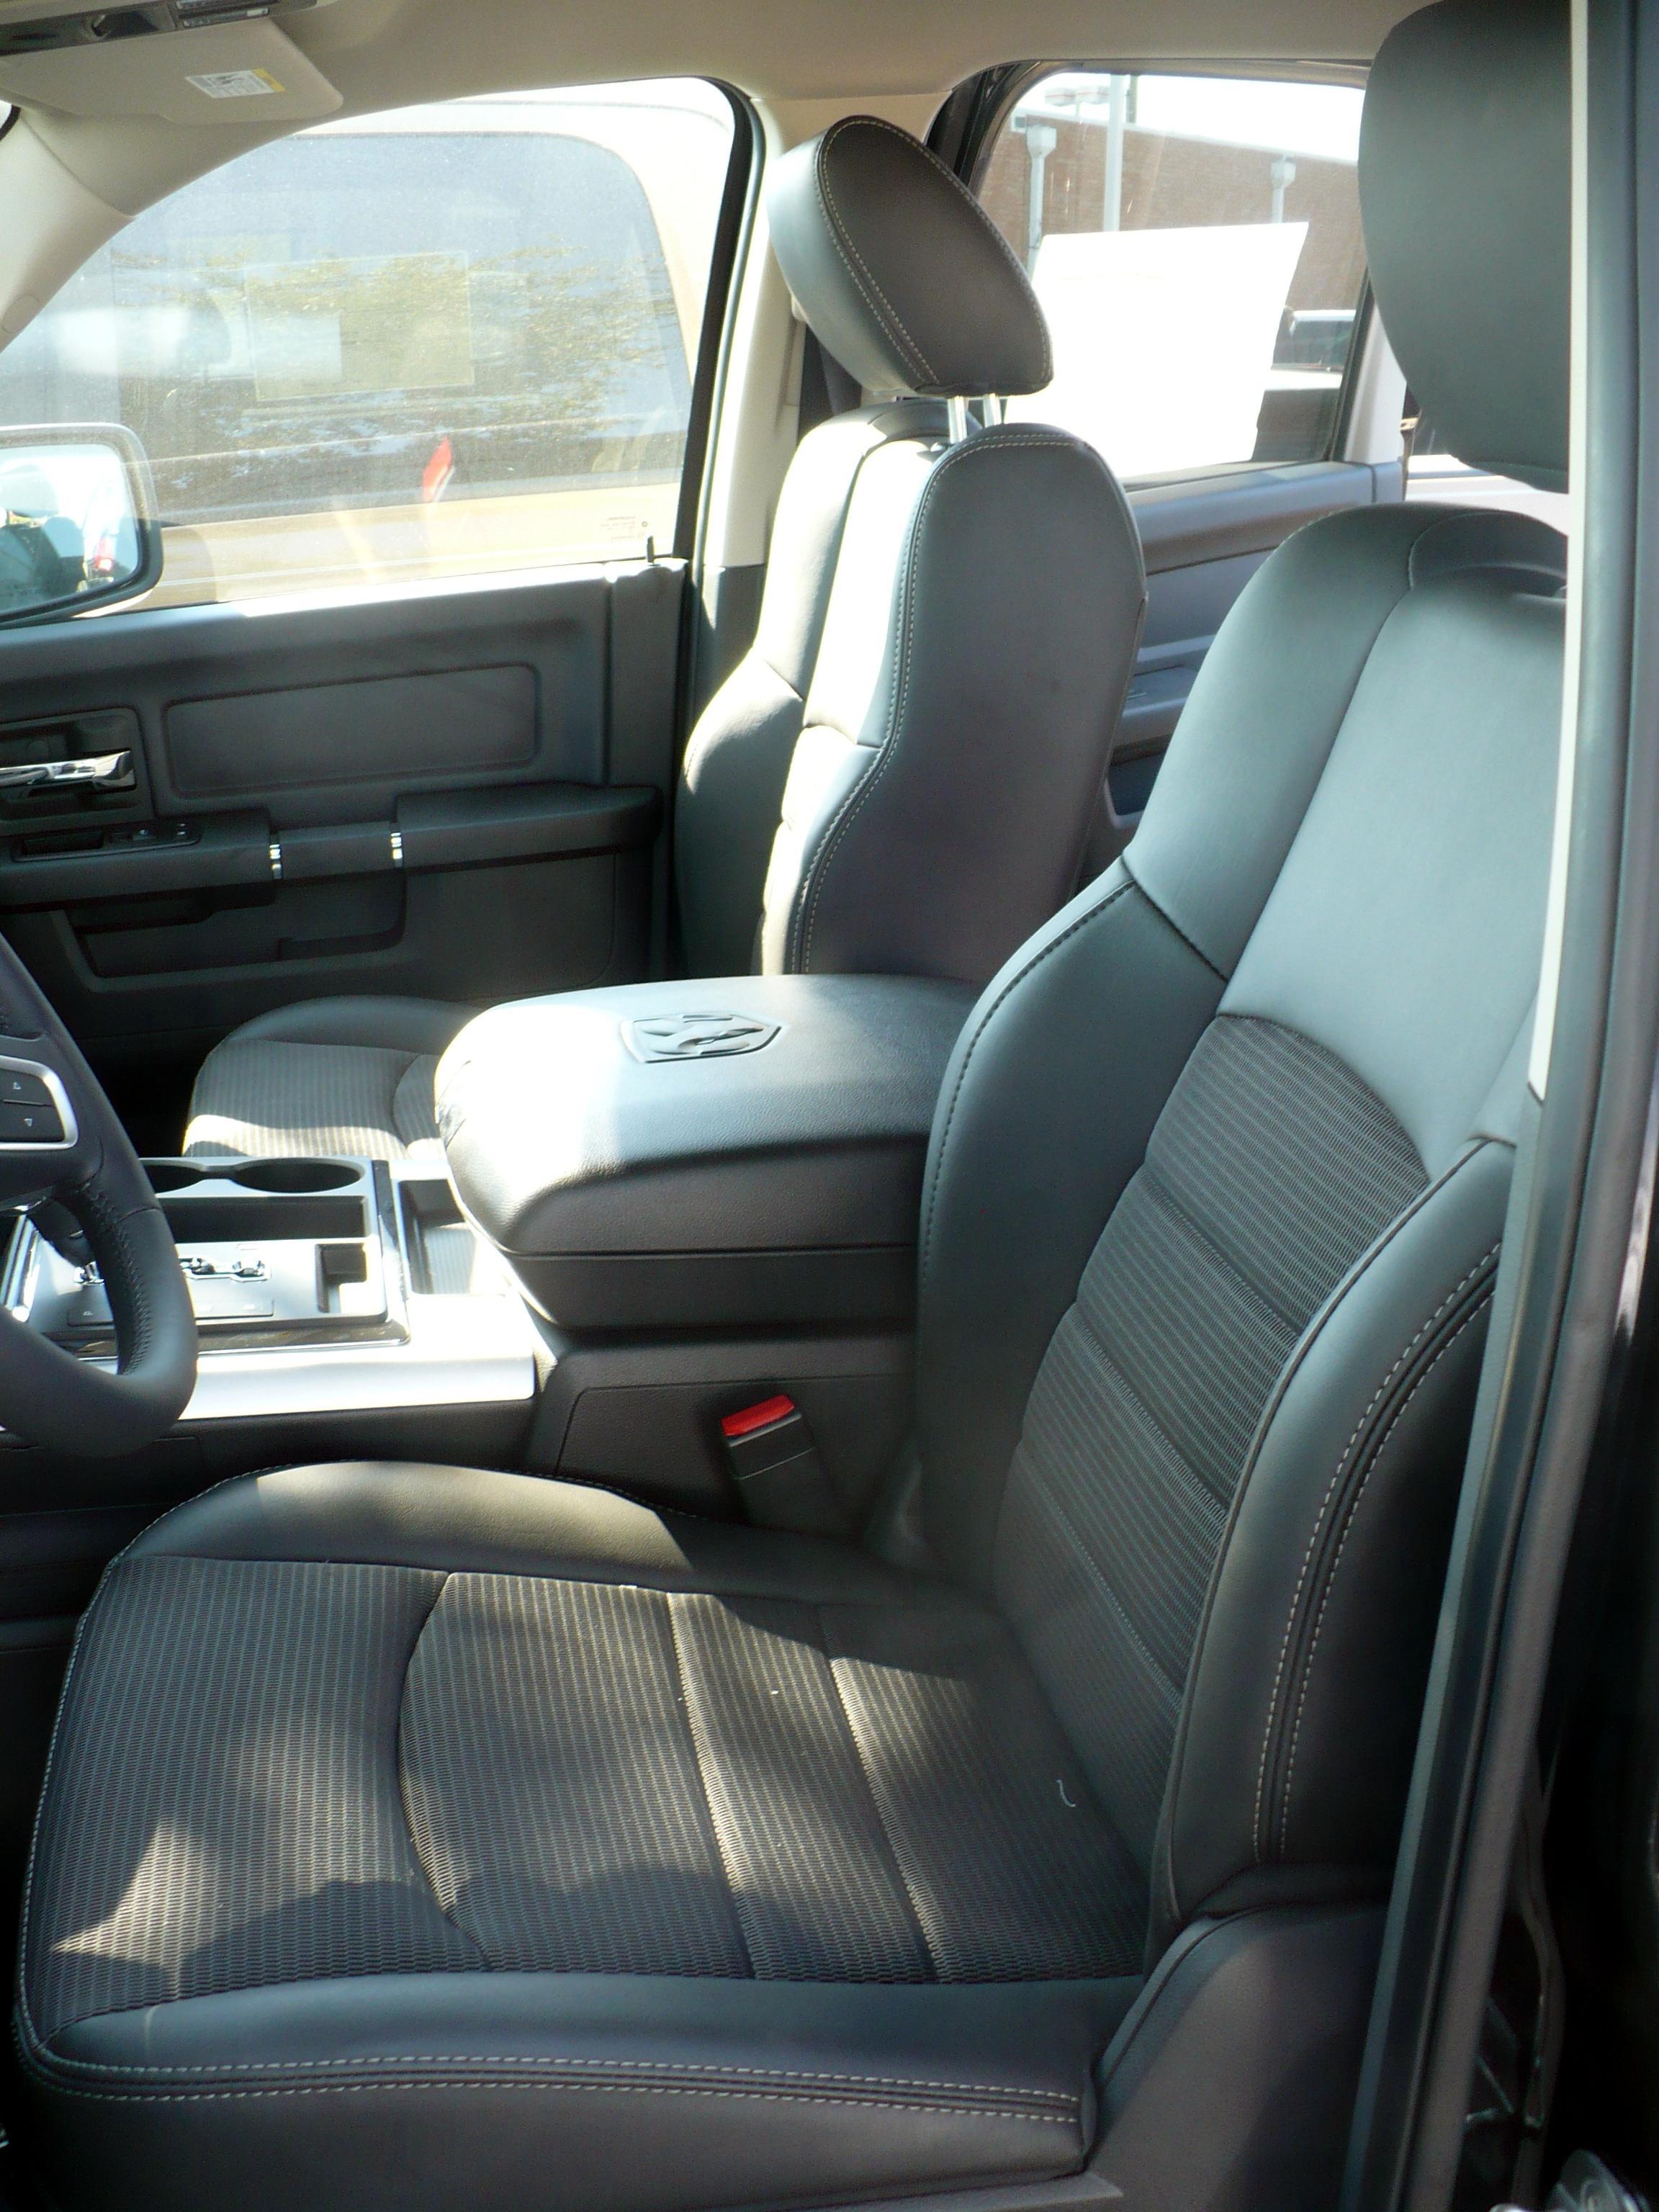 Dodge Ram 2500 Seat Covers >> 2009-2019 1500, 2009-2019 2500/3500 Dodge Ram Larime and ...